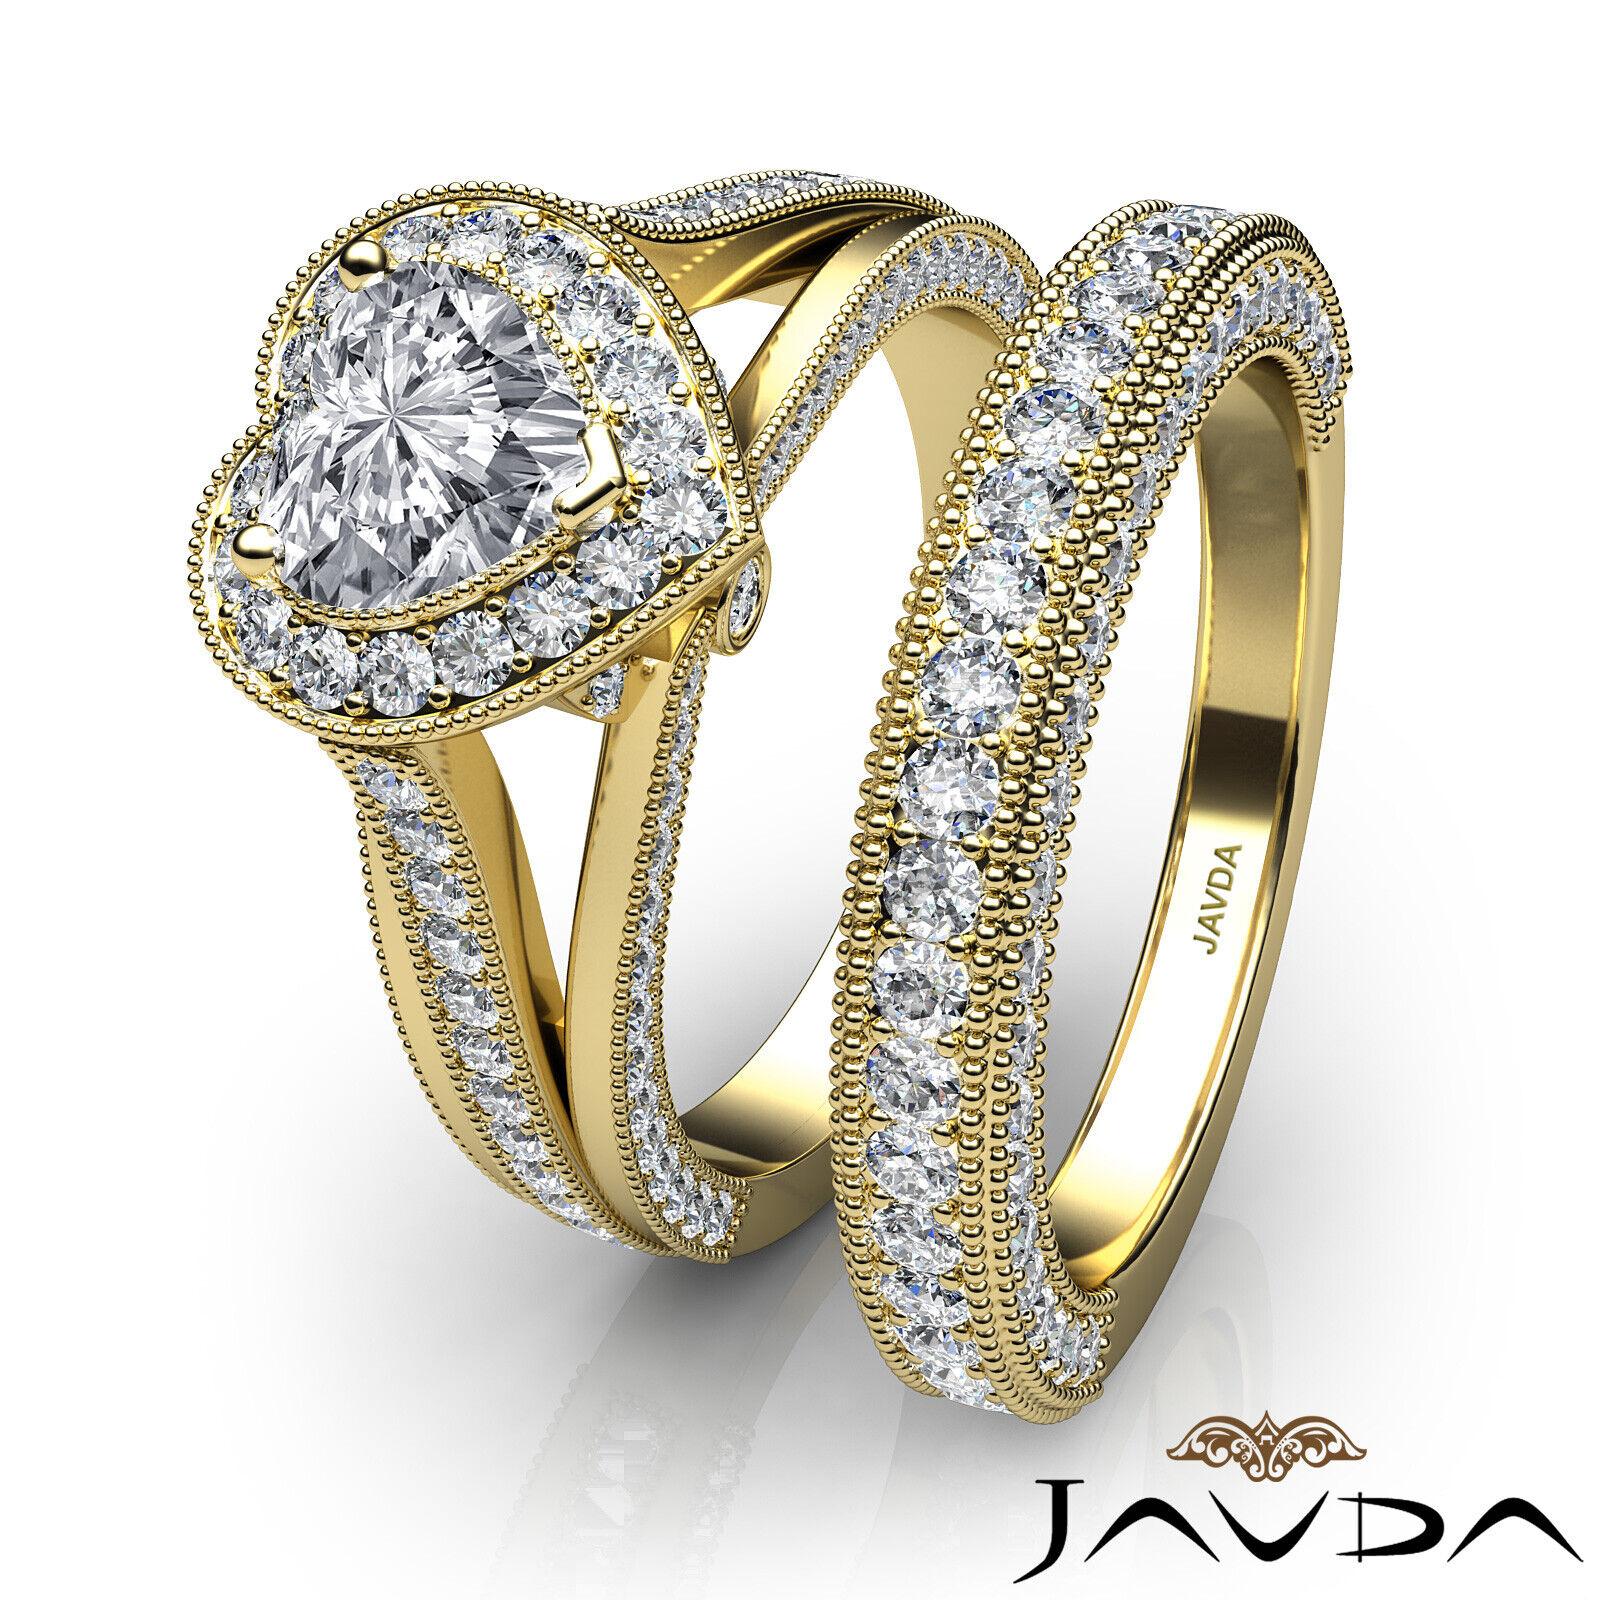 2.24ctw Halo Milgrain Edge Bridal Heart Diamond Engagement Ring GIA F-VS1  Gold 10